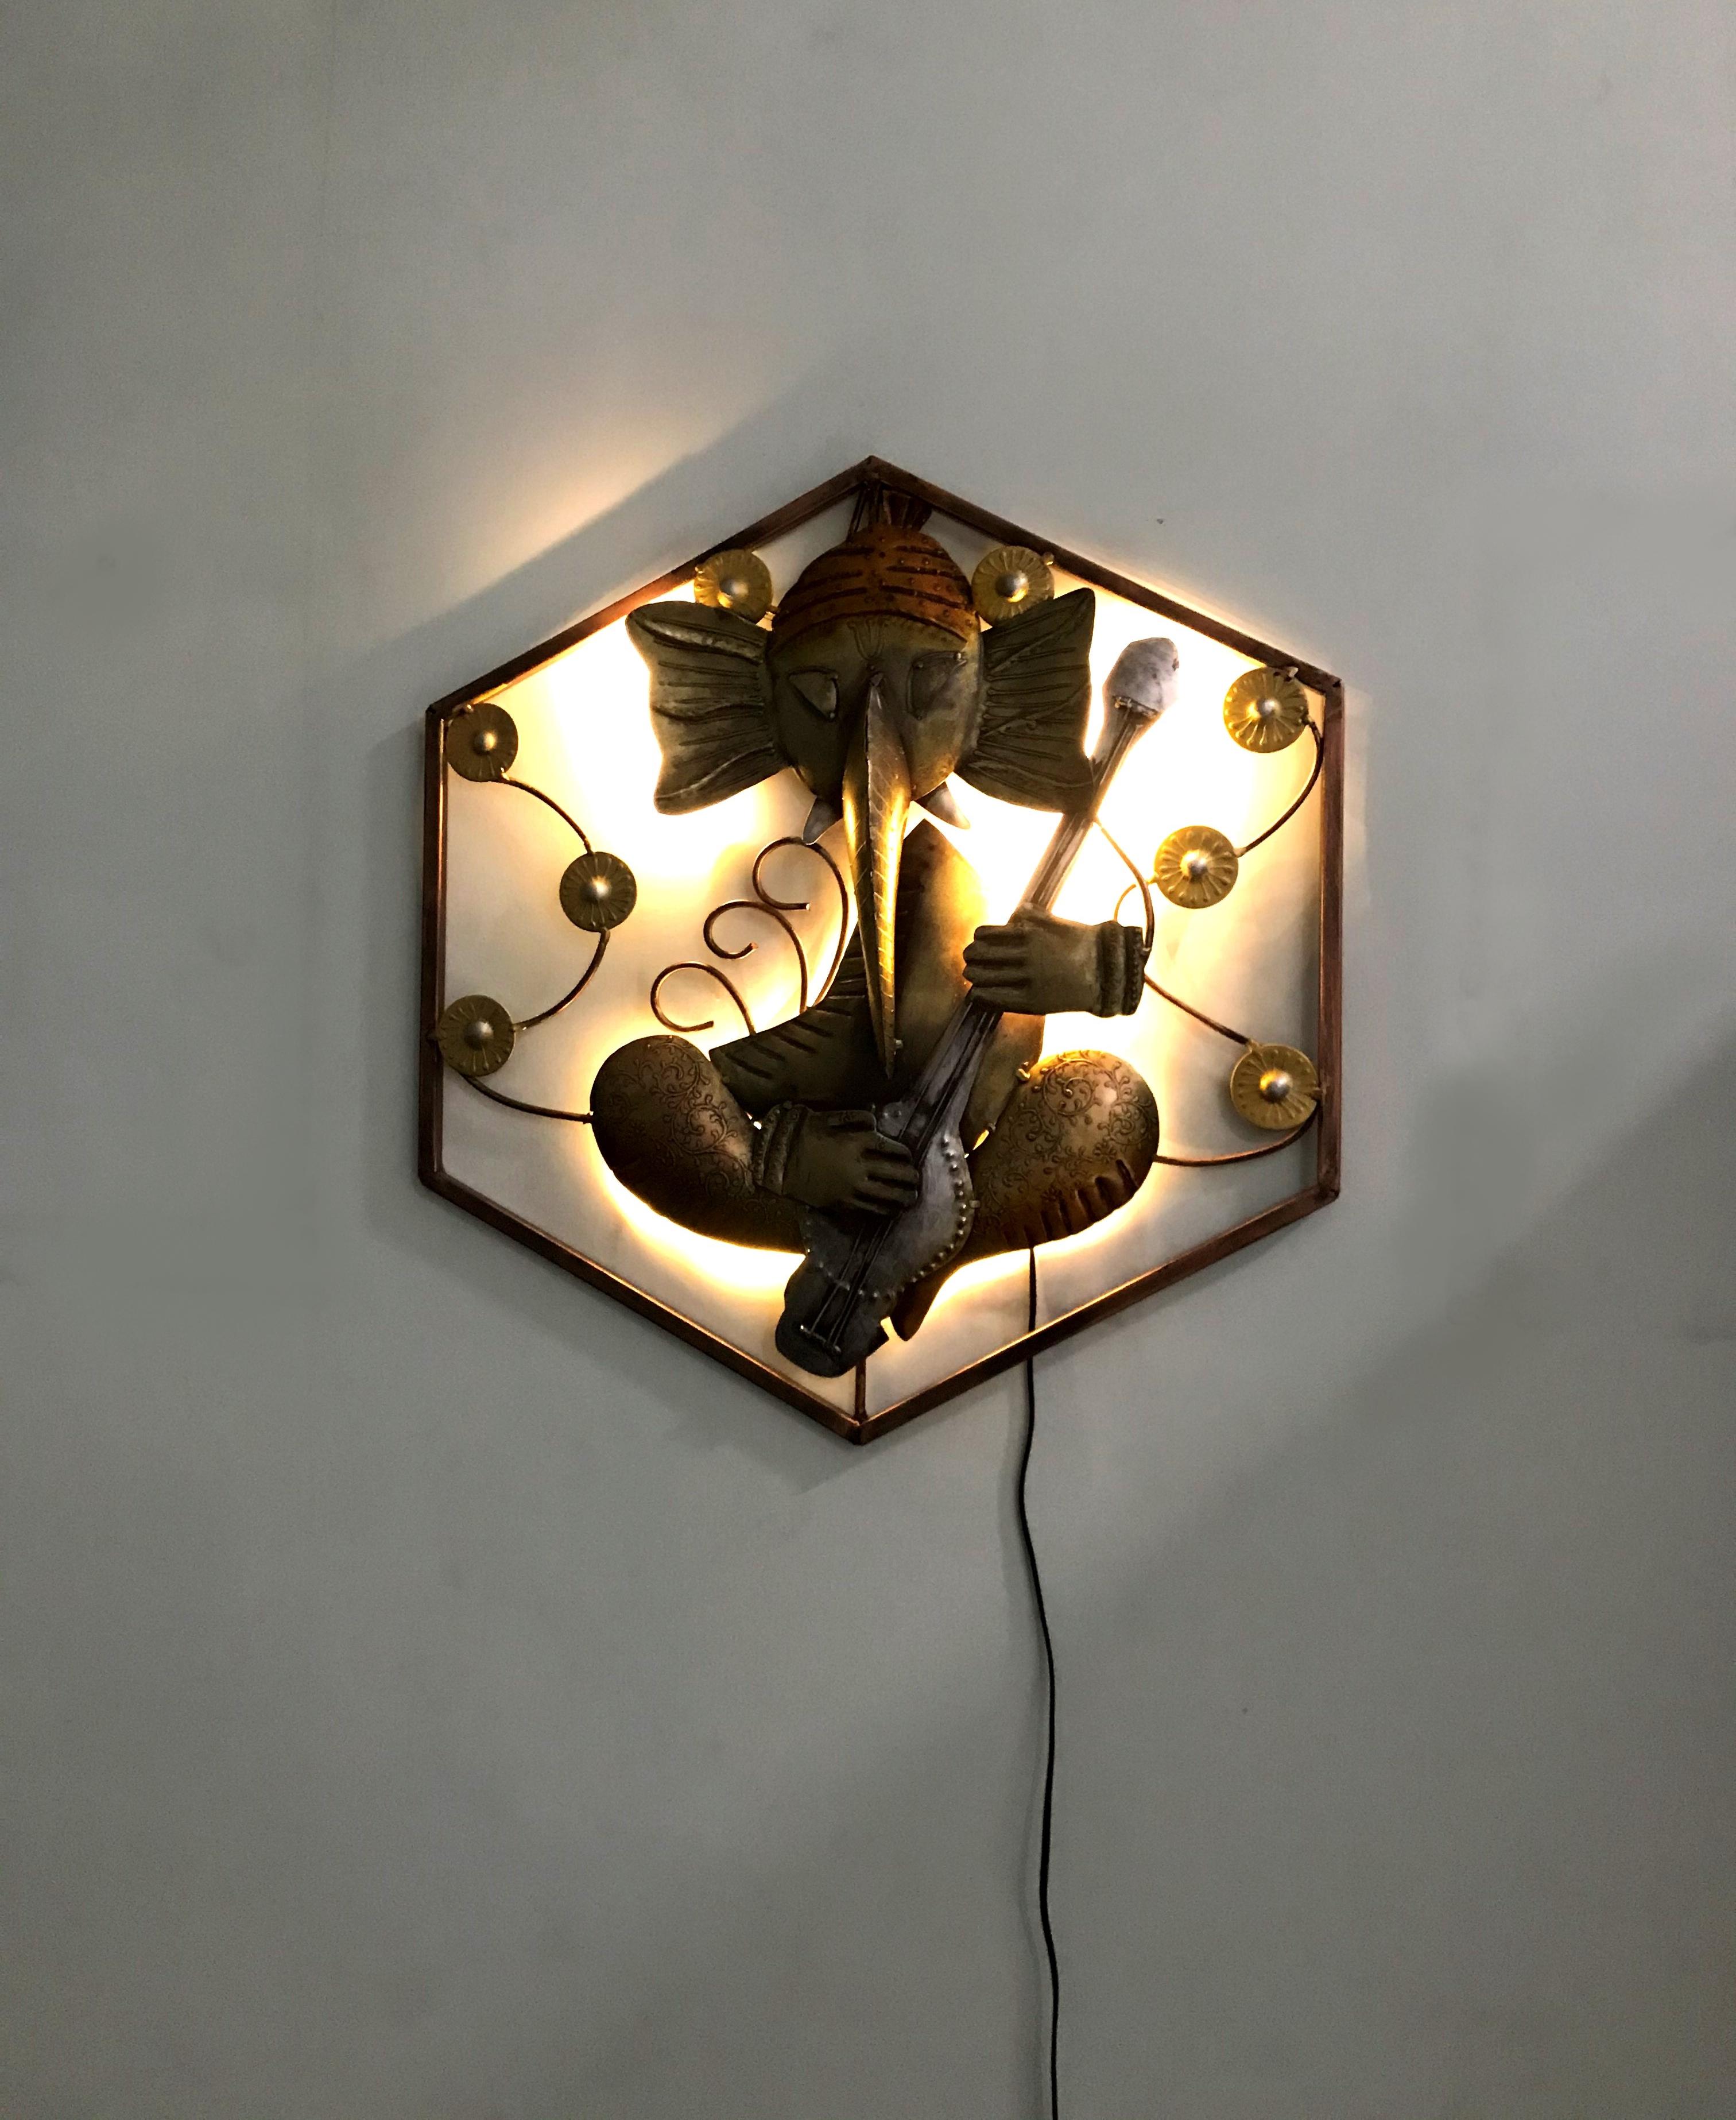 Lord Ganesha With LED Wall Decor